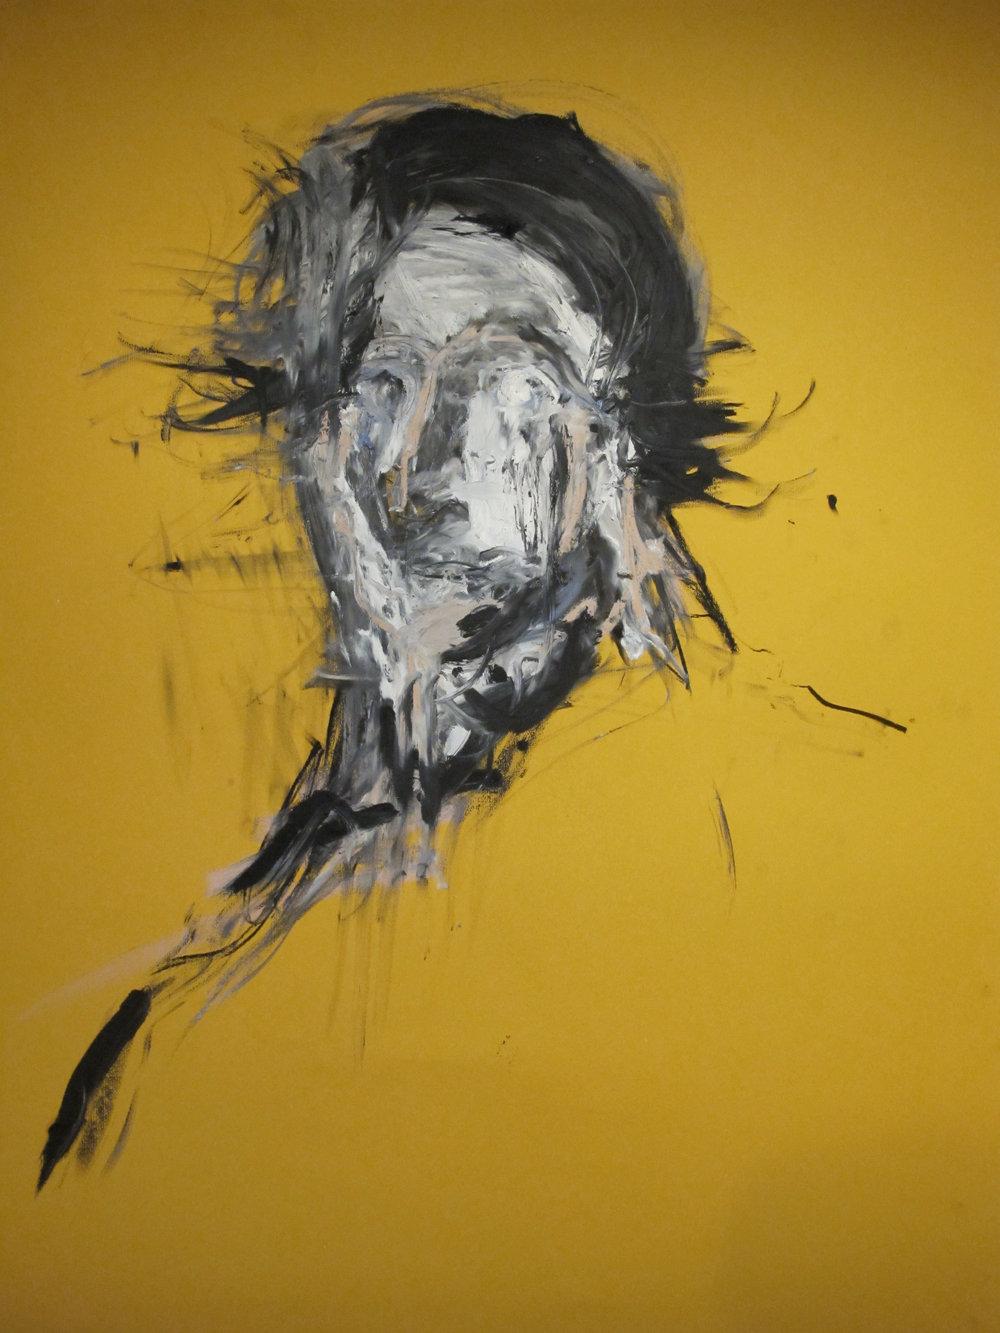 Charcoal_Oilbar_Yellow paper_70cm x 100cm